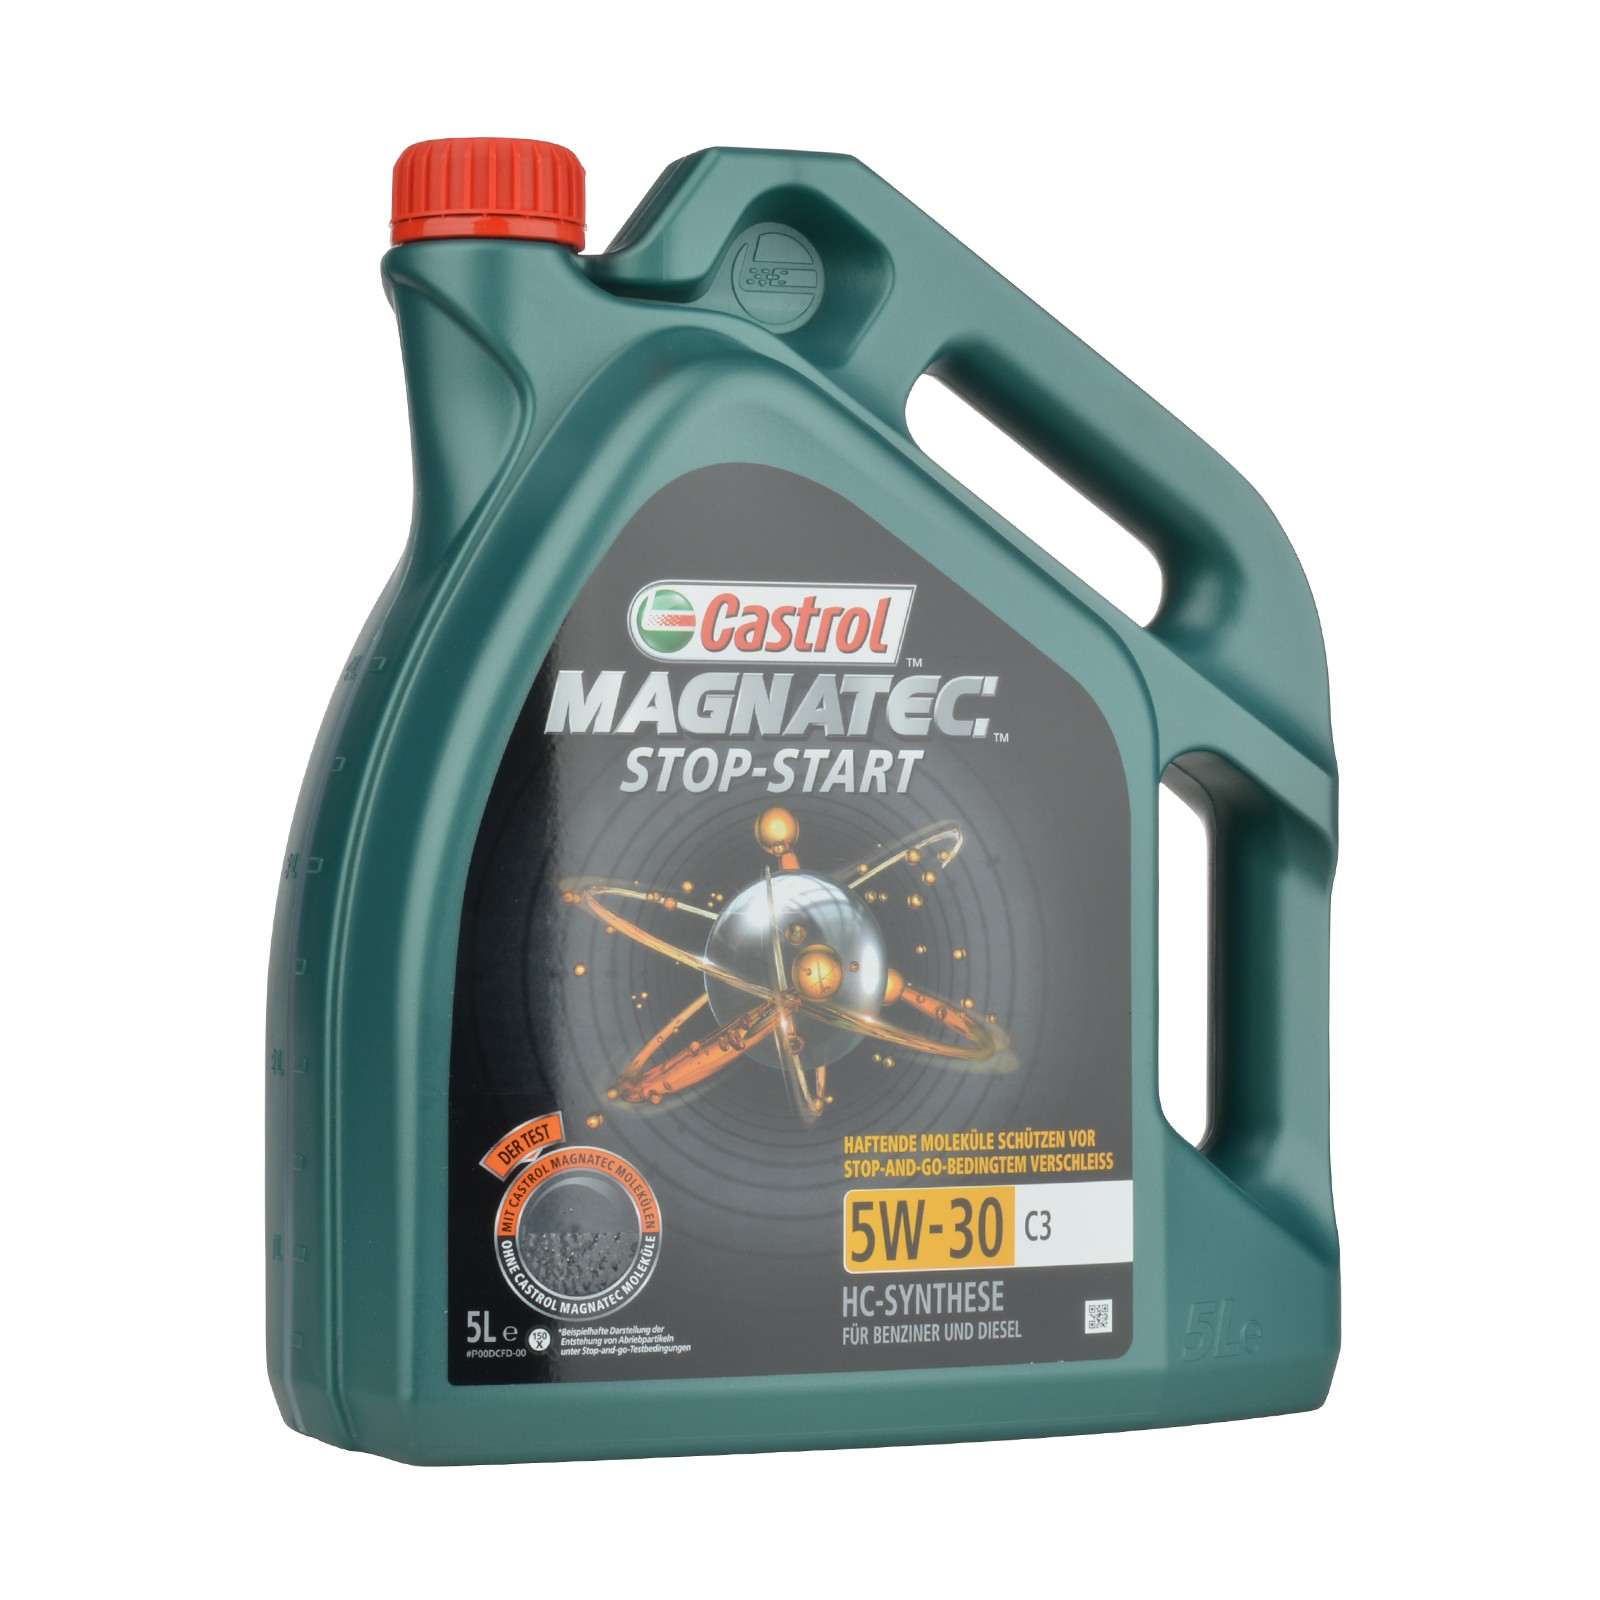 Castrol Magnatec Stop-Start 5W-30 C3 - 5 Liter – Bild 1